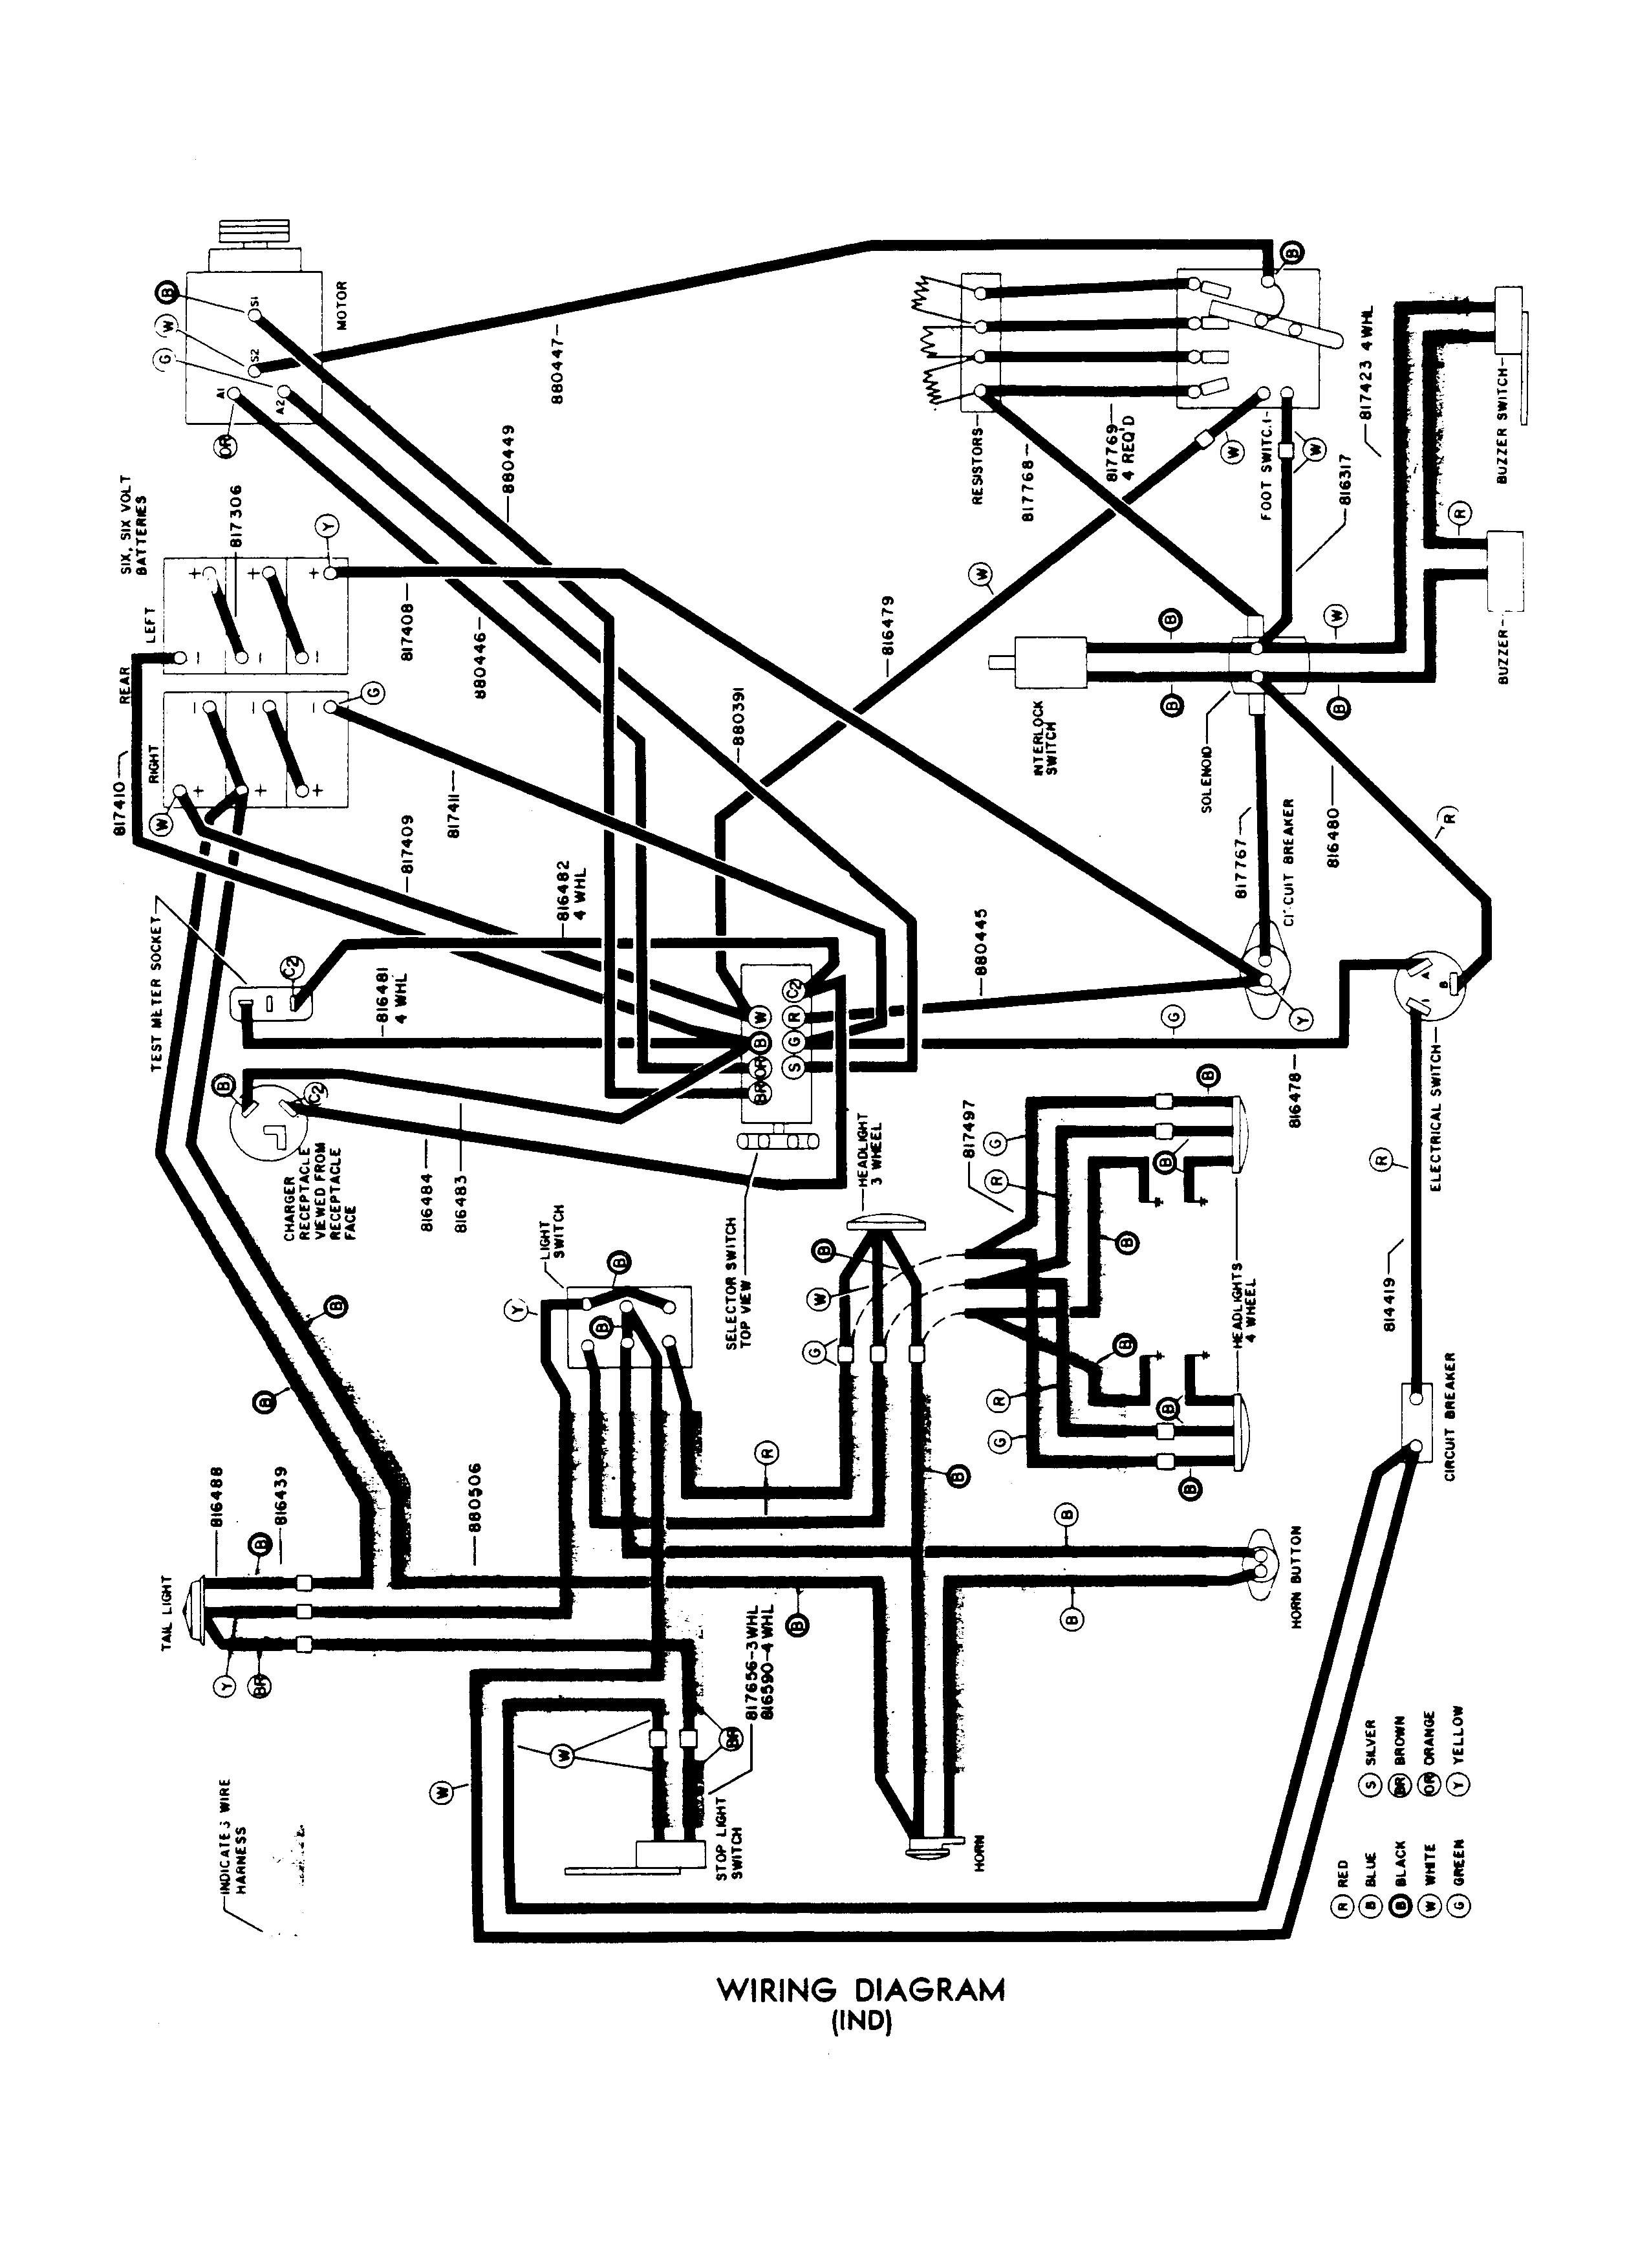 1972 Triumph Tr6 Wiring Diagram